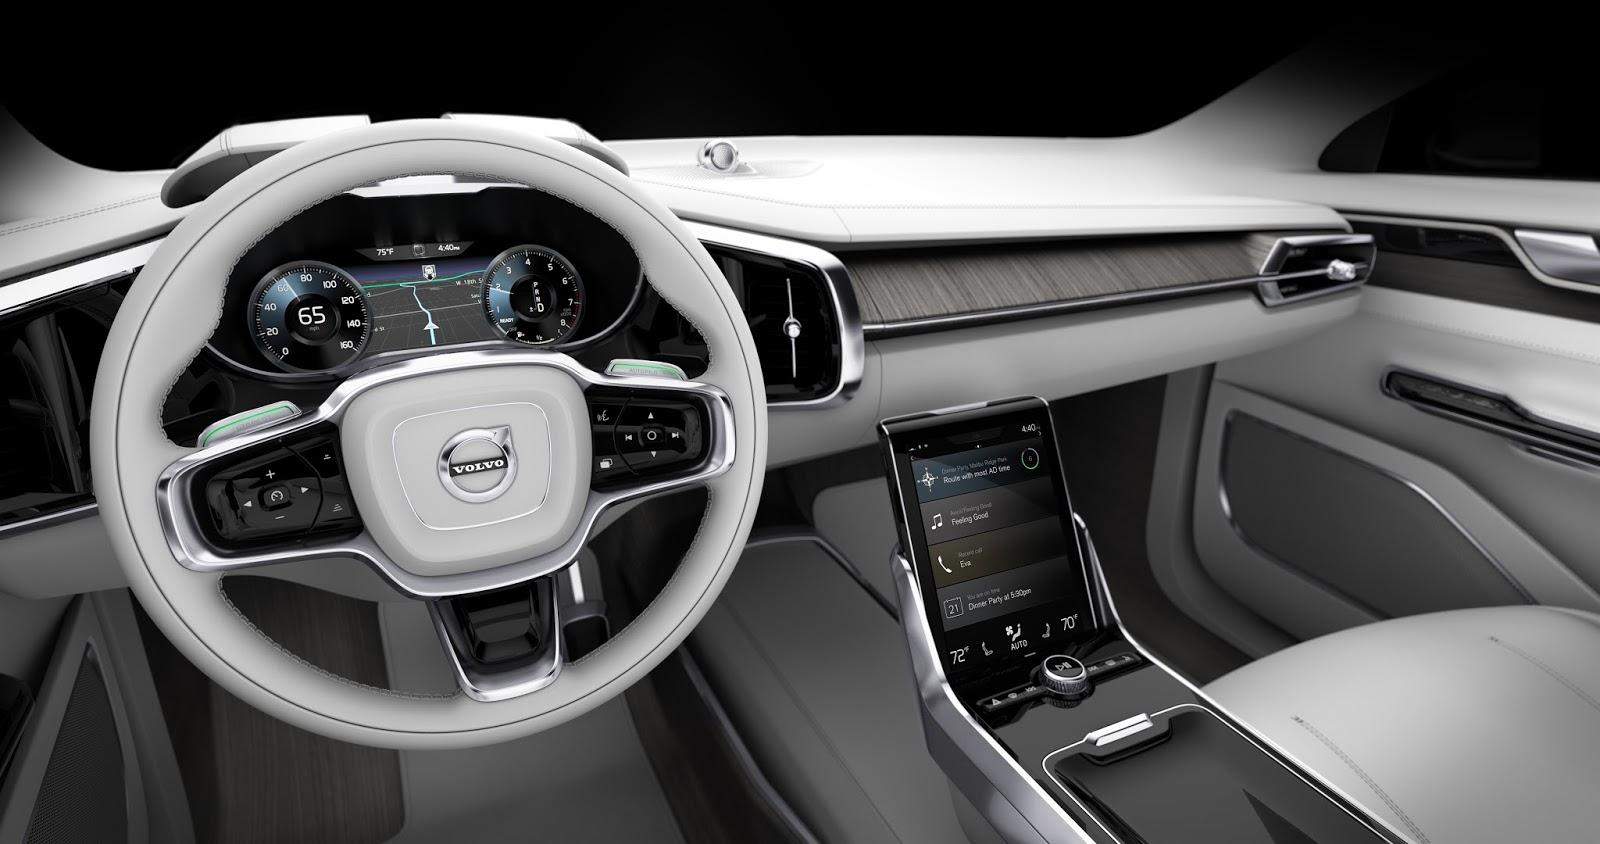 169539 Concept 26 Η Volvo θα κάνει και την αυτόνομη οδήγηση διασκεδαστική Autonomous Driving, Volvo, Volvo XC90, Αυτόνομη οδήγηση